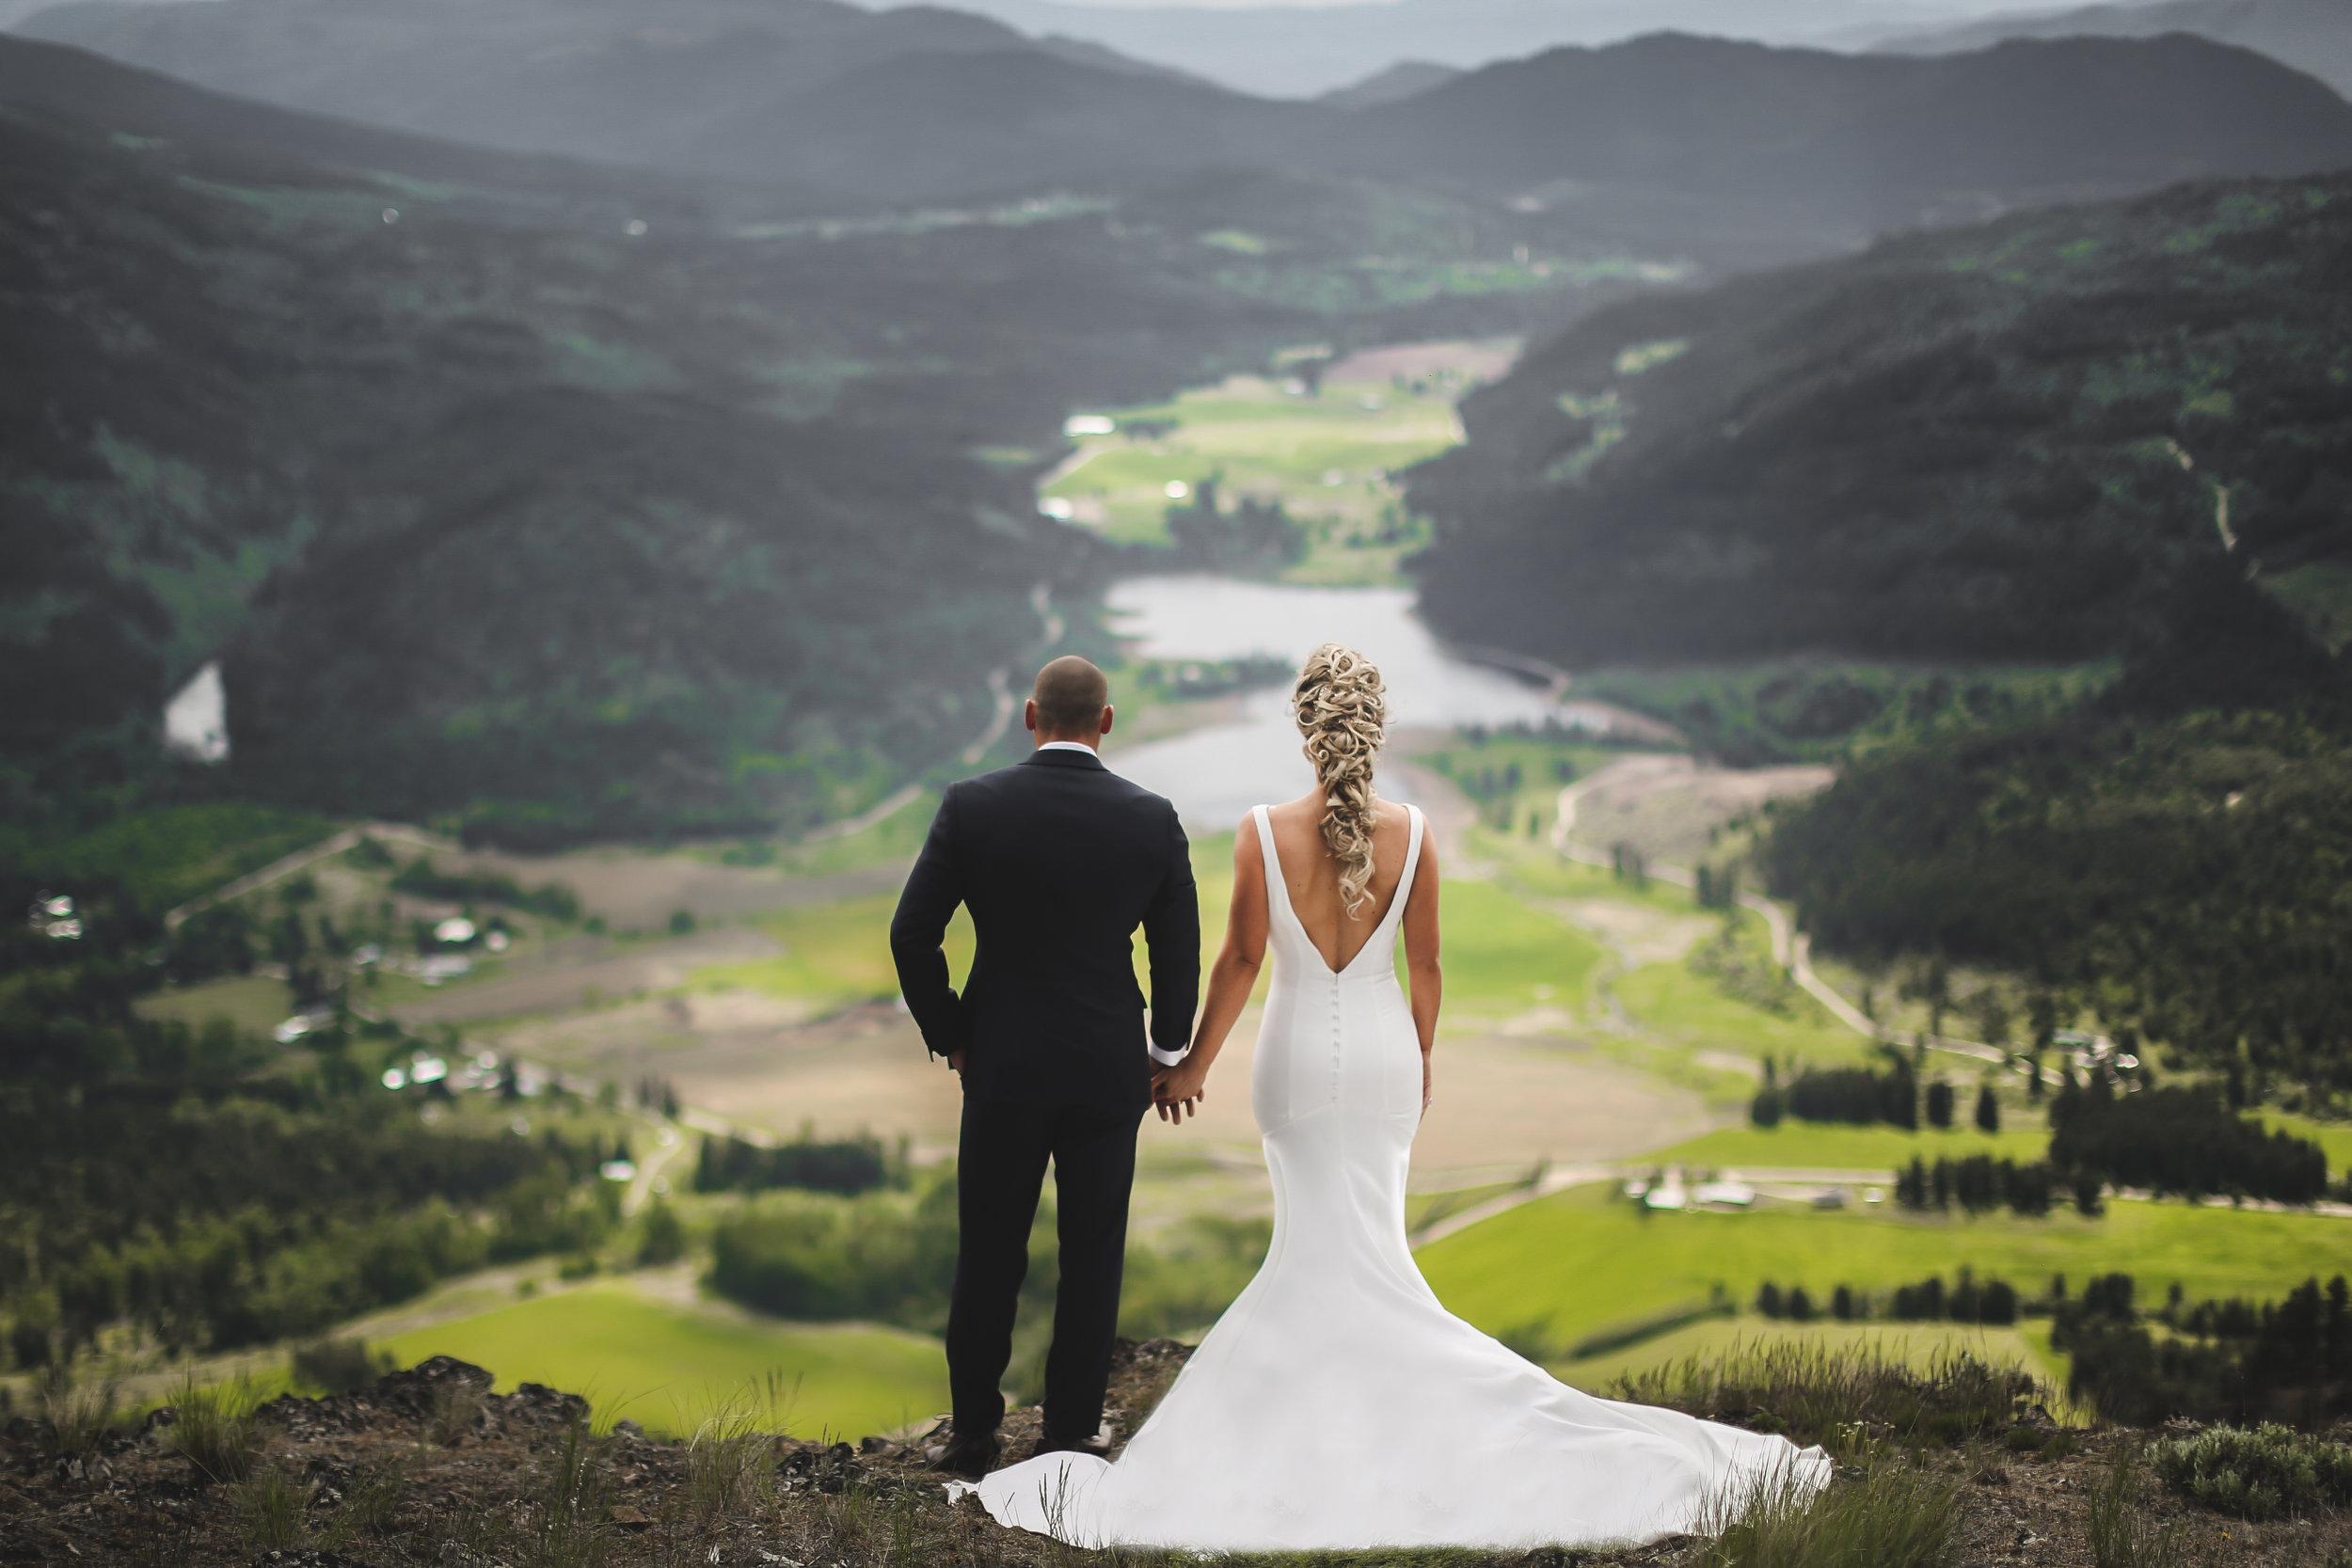 08 Adam Ziorio Photography - Kate & Ben's Wedding.jpg